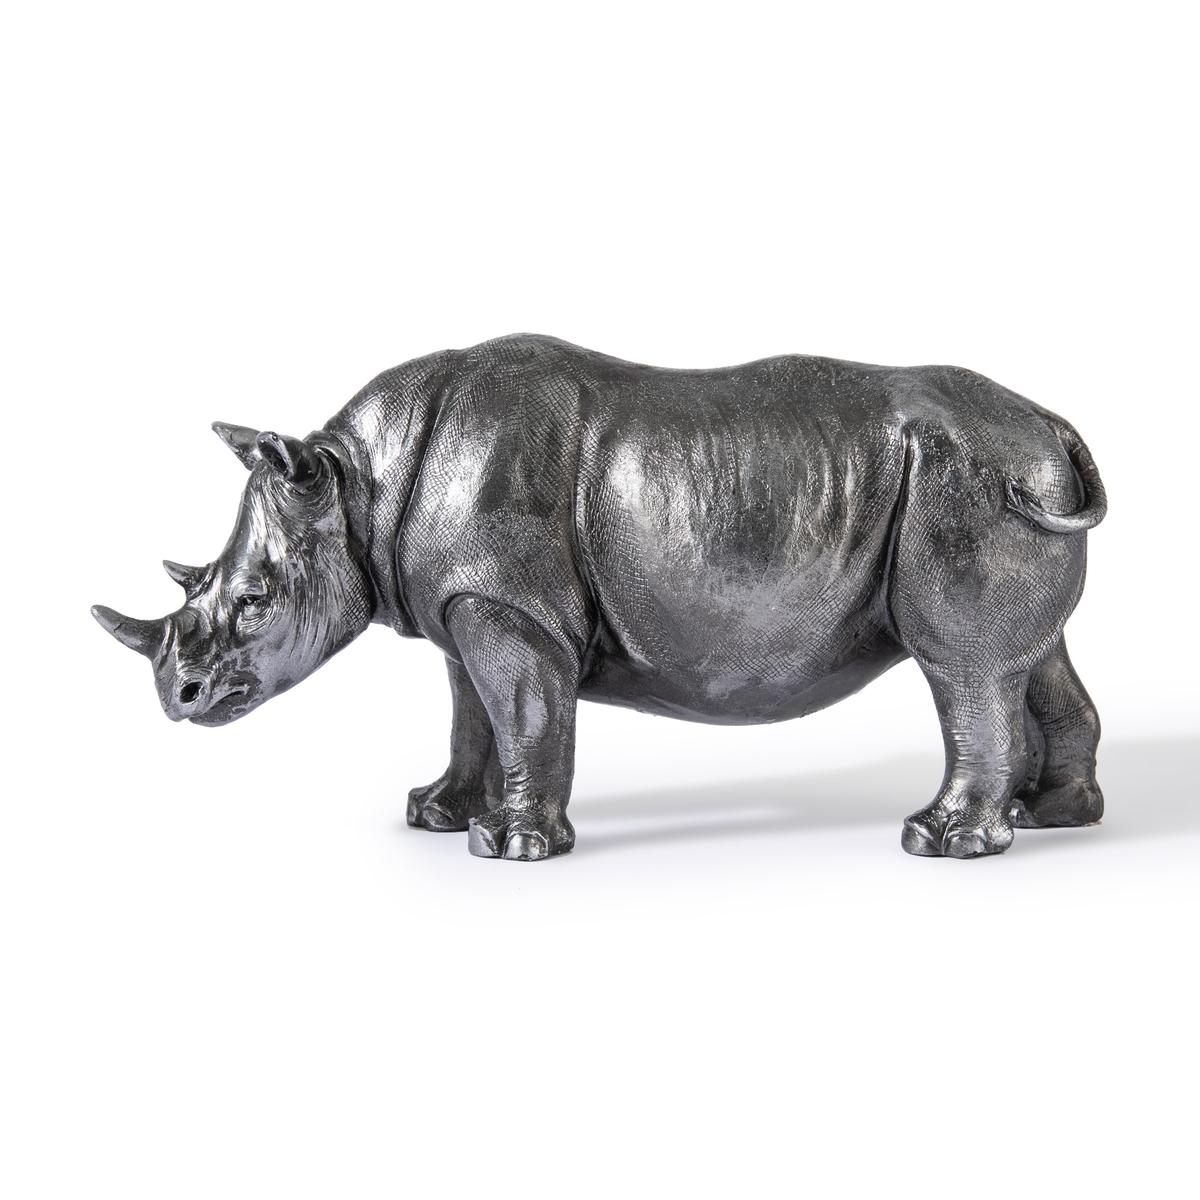 Статуэтка LaRedoute Носорога Kami единый размер серебристый